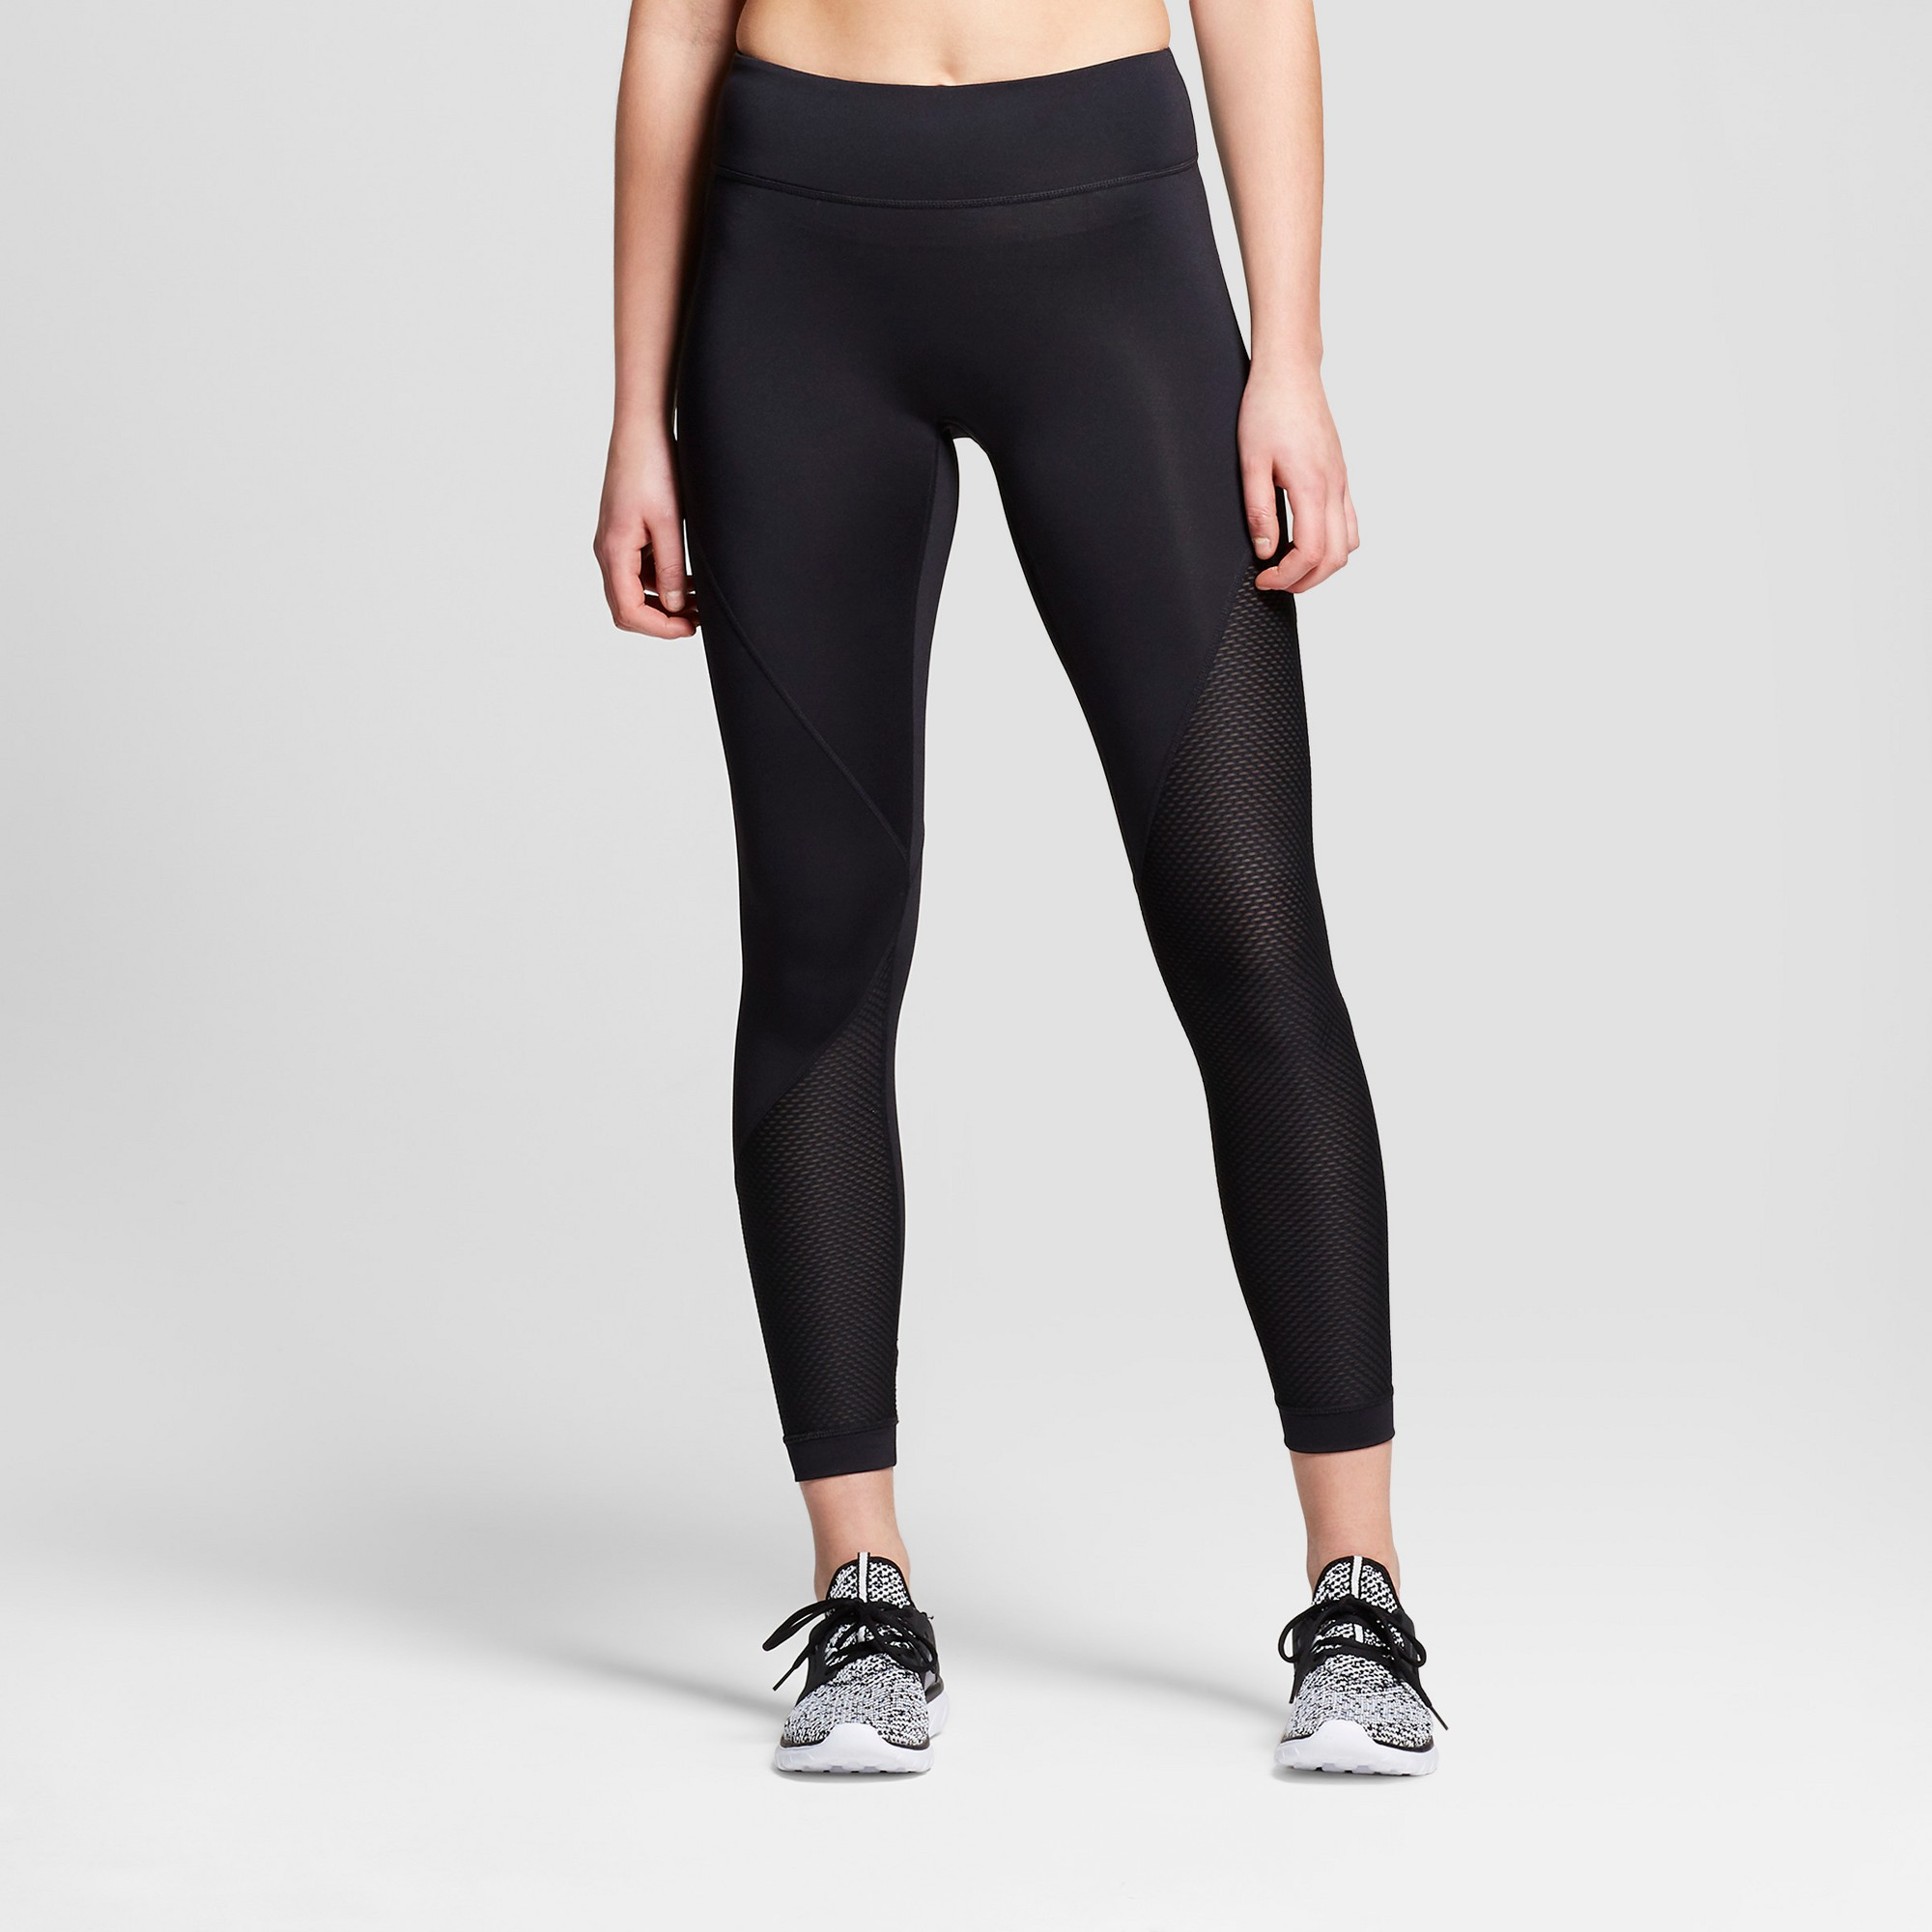 27122ce28 Women s Performance 7 8 Asymmetrical Leggings - JoyLab Black S ...